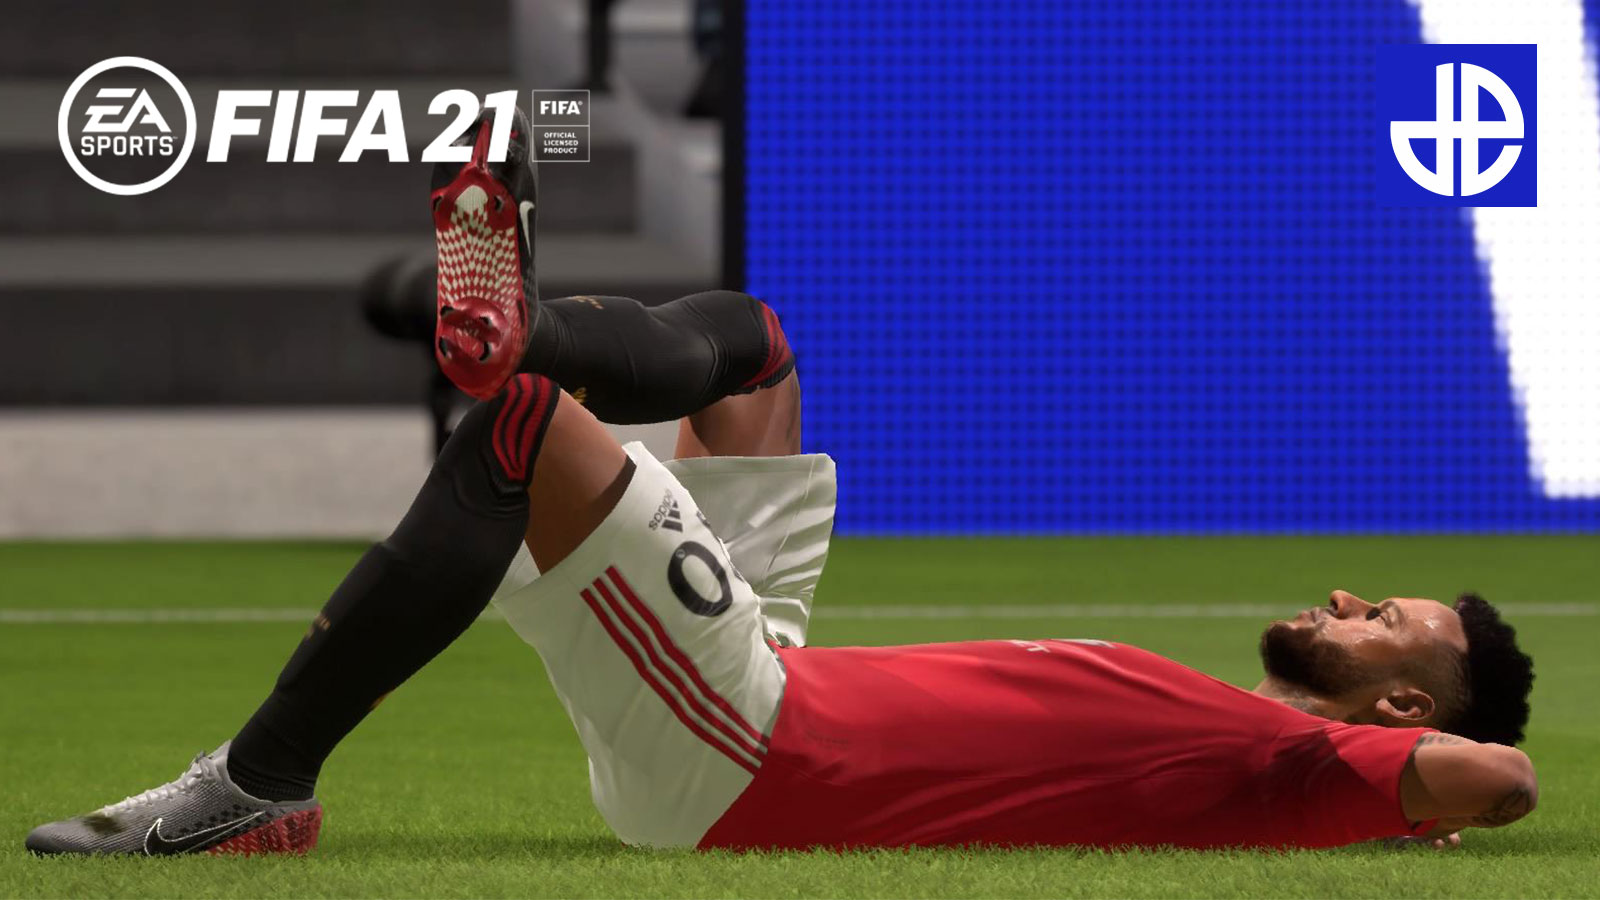 fifa21 celebration